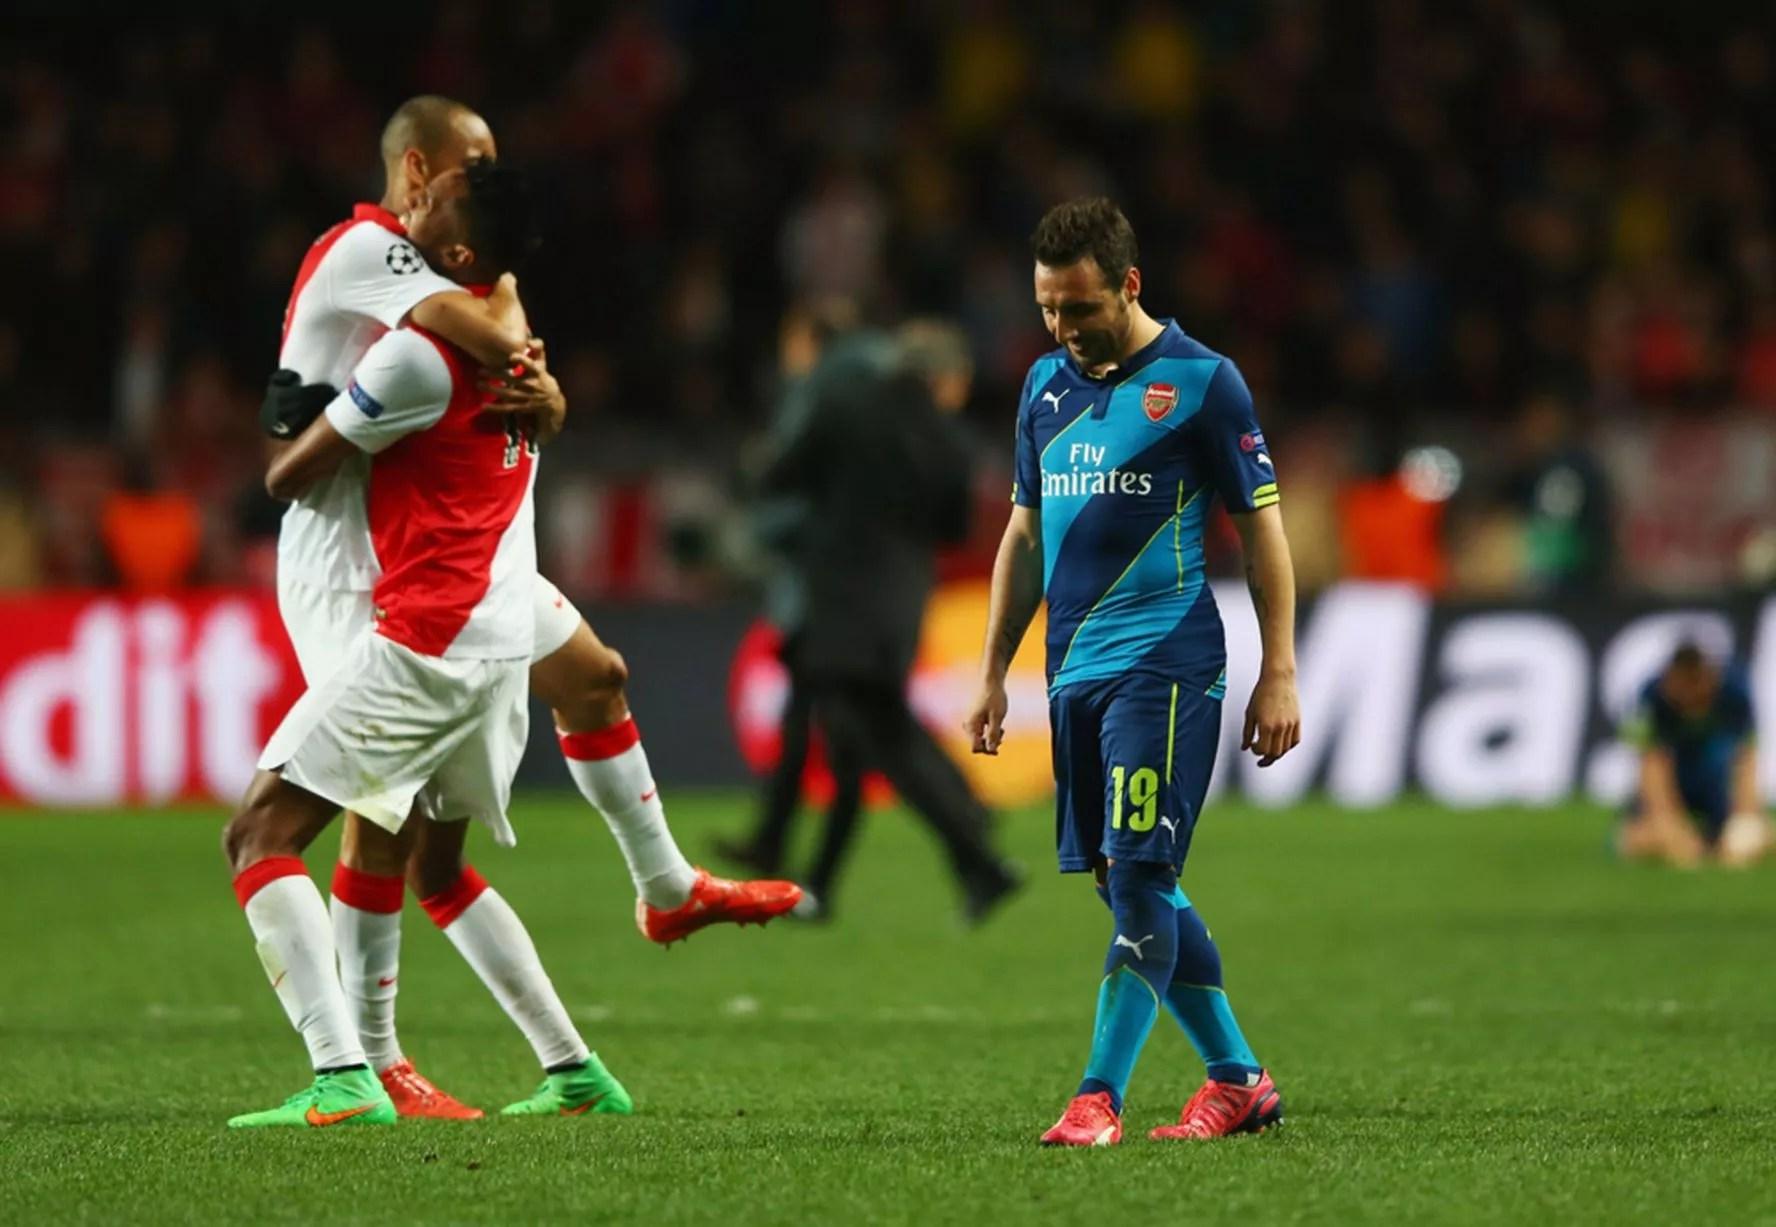 Santi Cazorla looks dejected as Monaco players celebrate